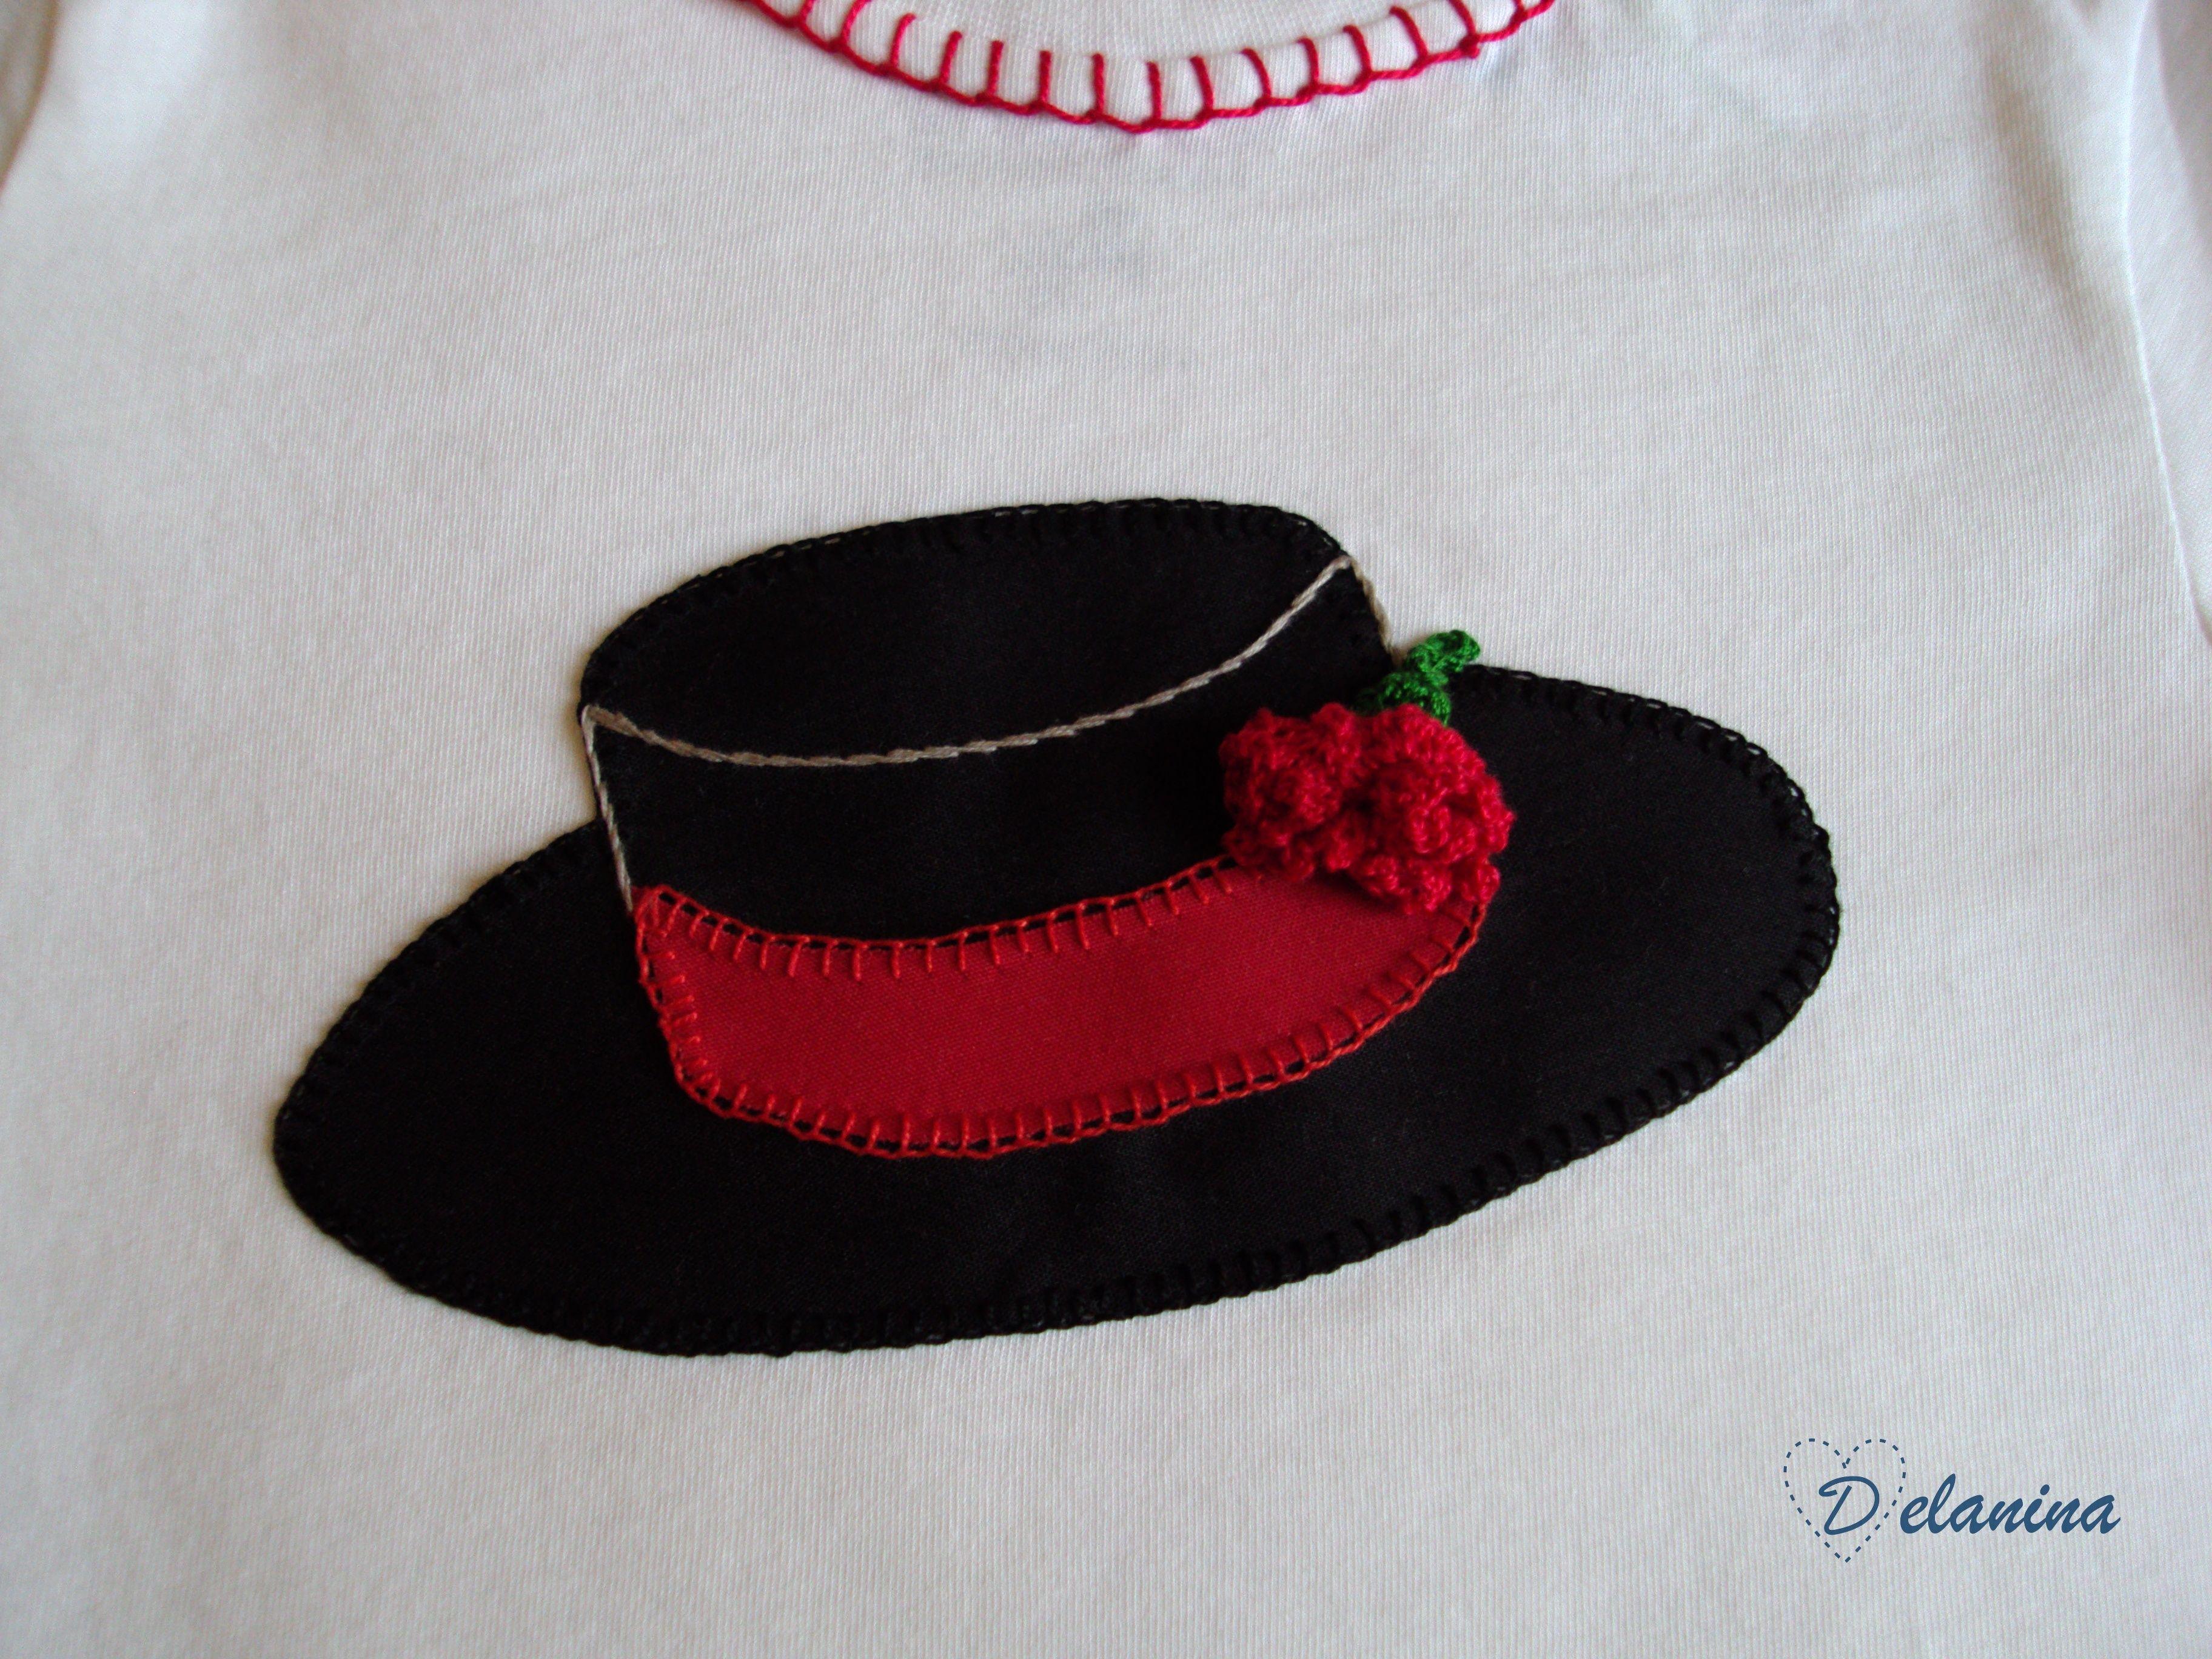 Camiseta sombrero cordobés patchwork Camiseta realizada con aplicaciones en  tela tipo patchwork. 3cd950b1d7e